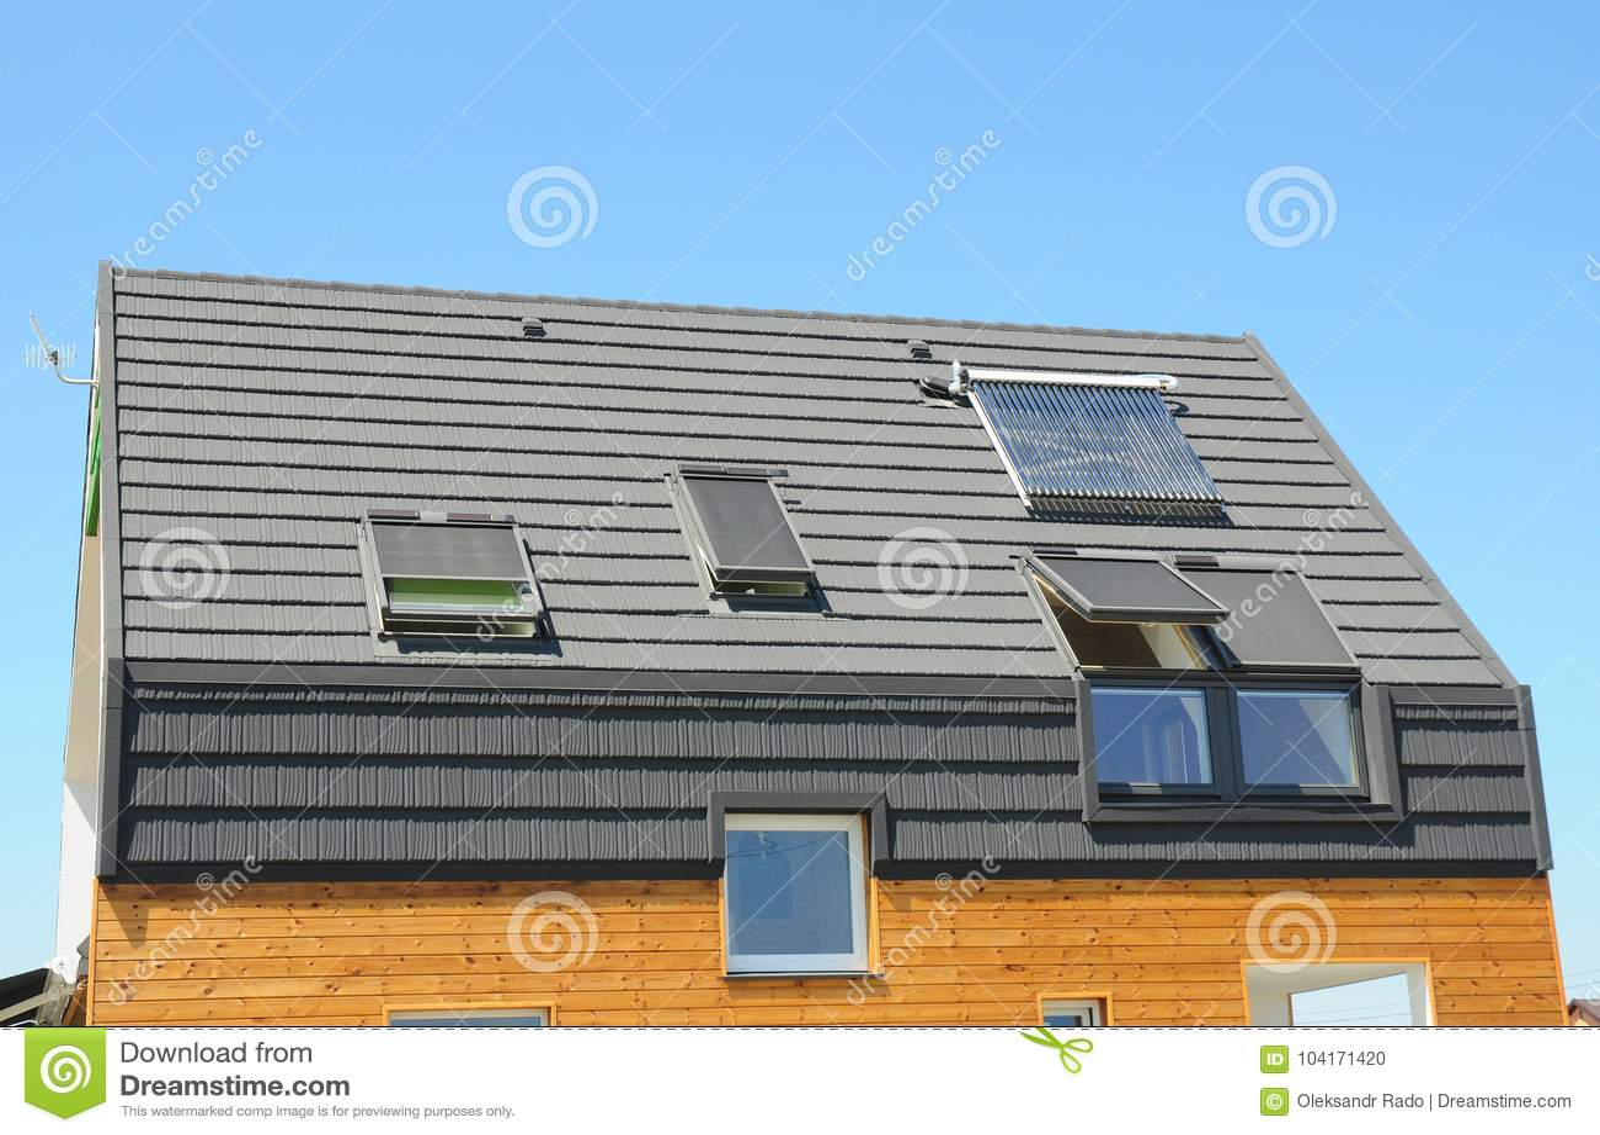 Modern huisdak met zonnewaterverwarmer zonnepanelen en dakramen